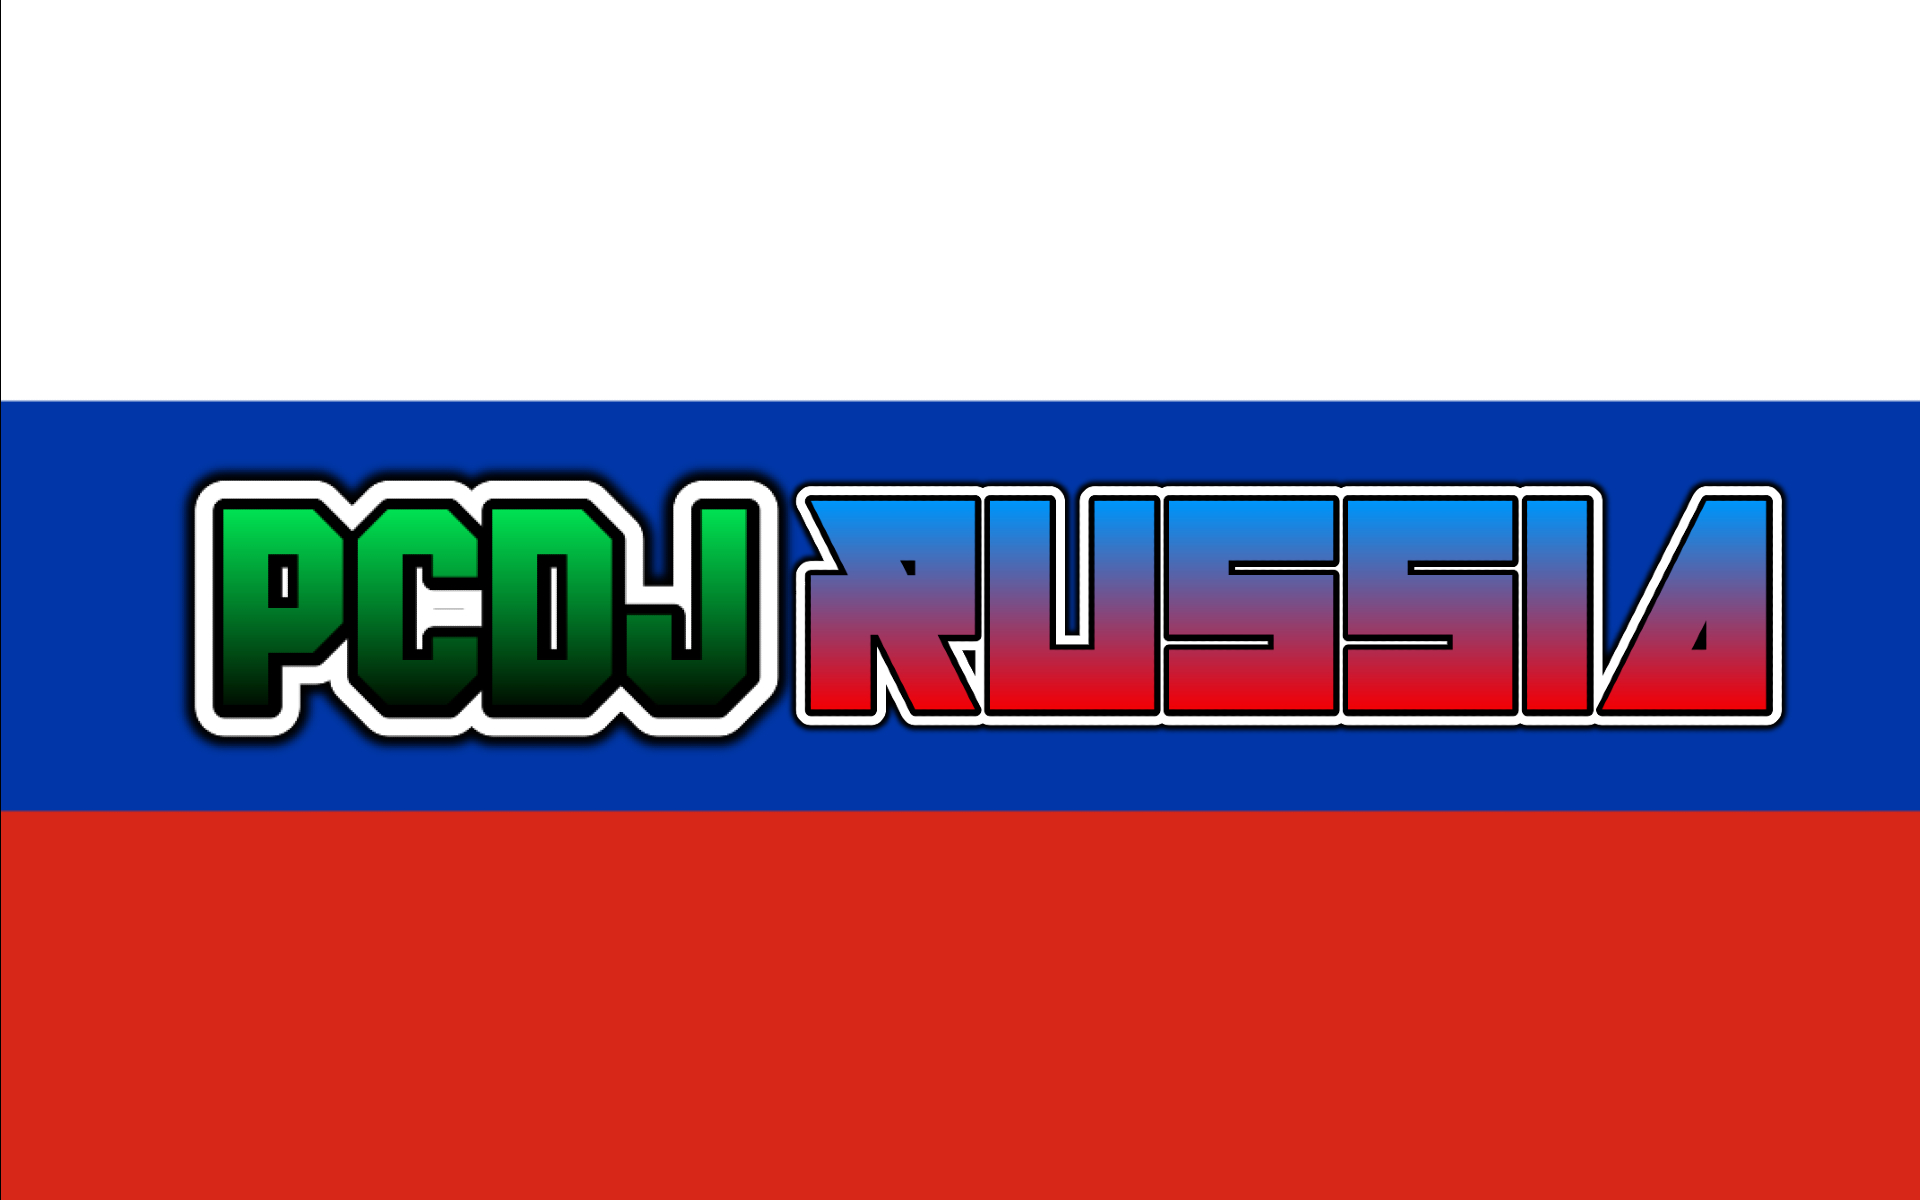 PCDJ RUSSIA